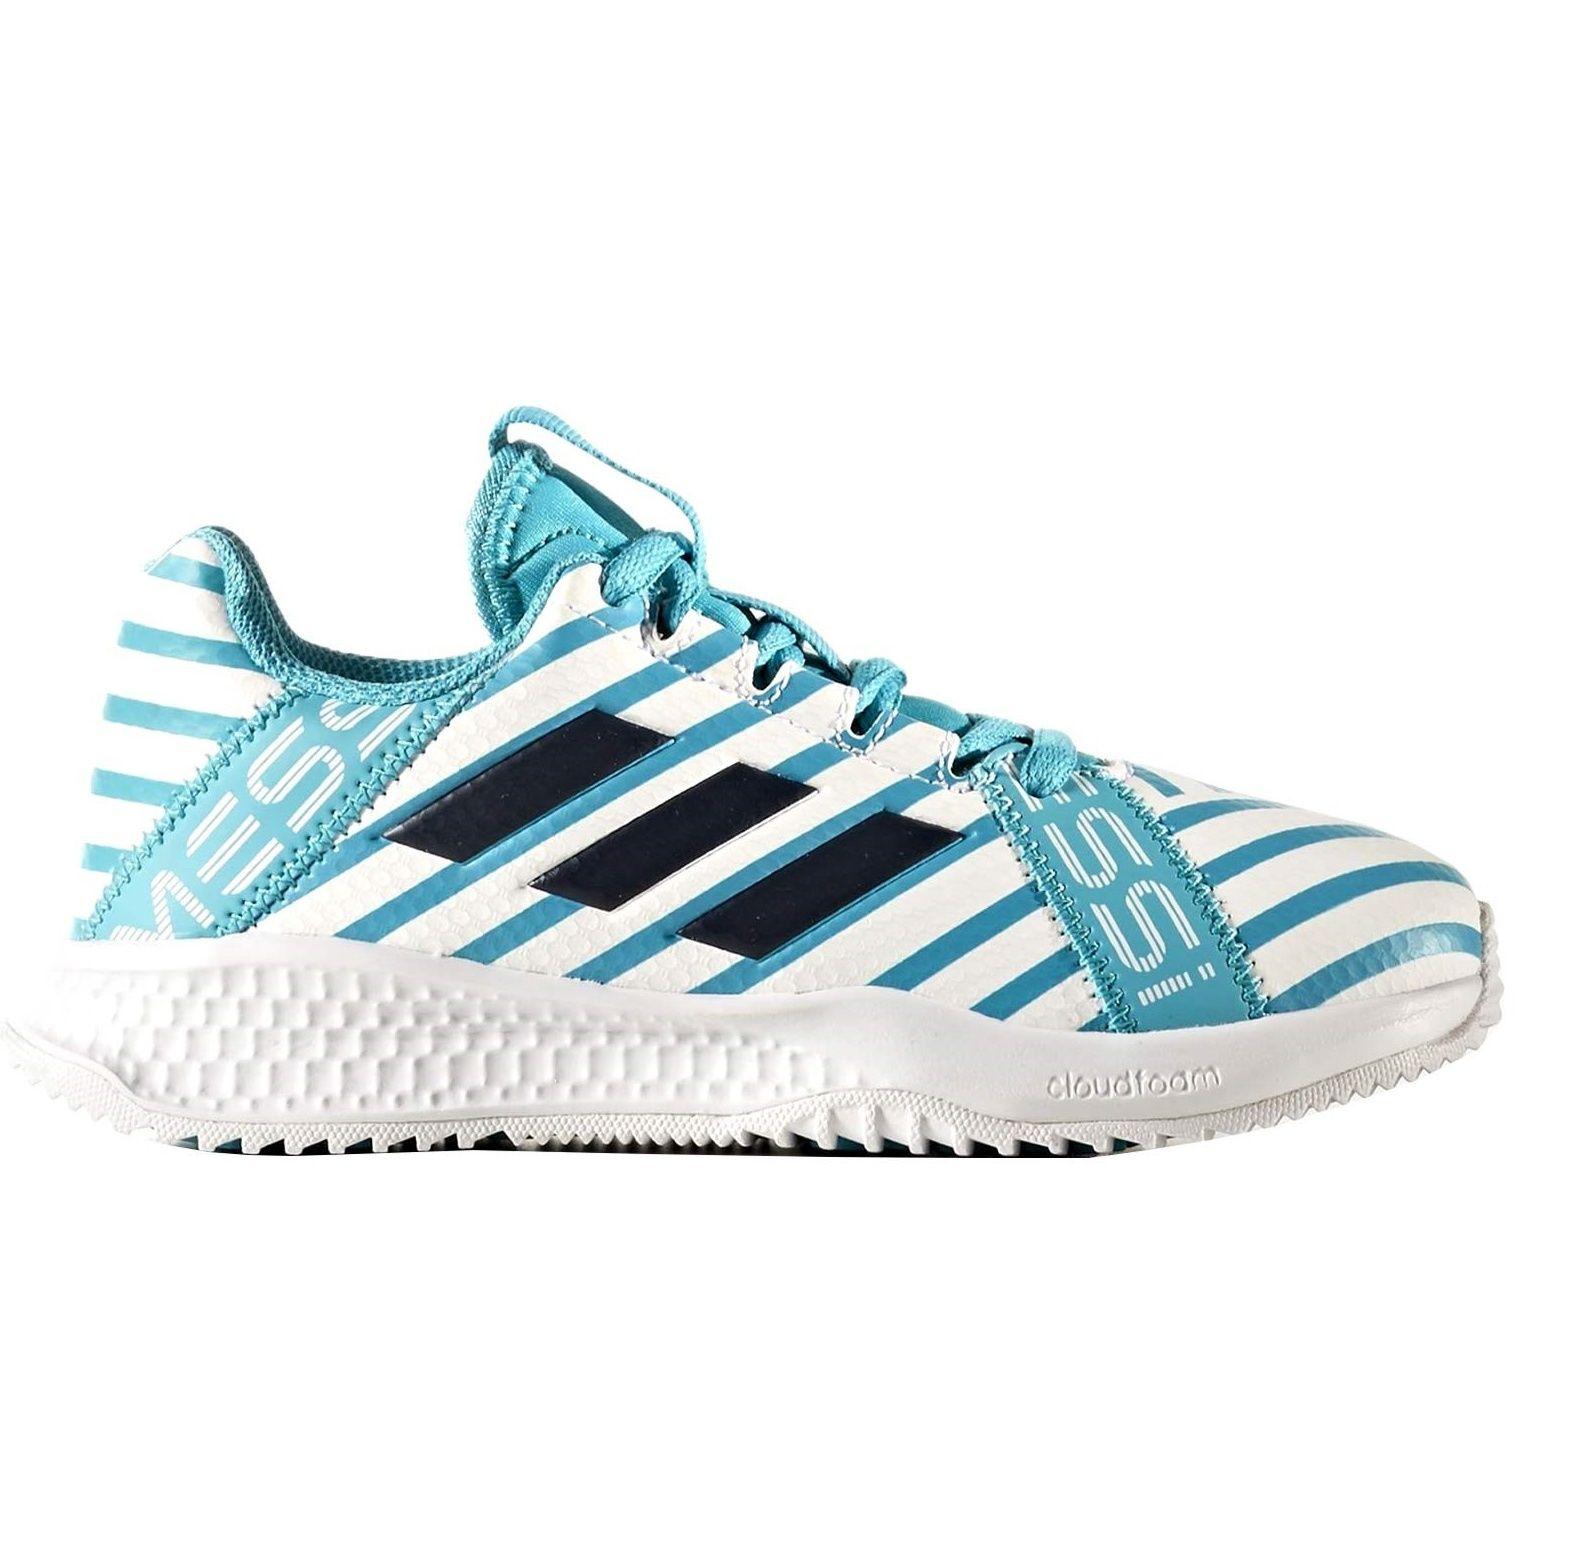 کفش فوتبال بندی پسرانه RapidaTurf Messi - آدیداس - آبی و سفید - 1